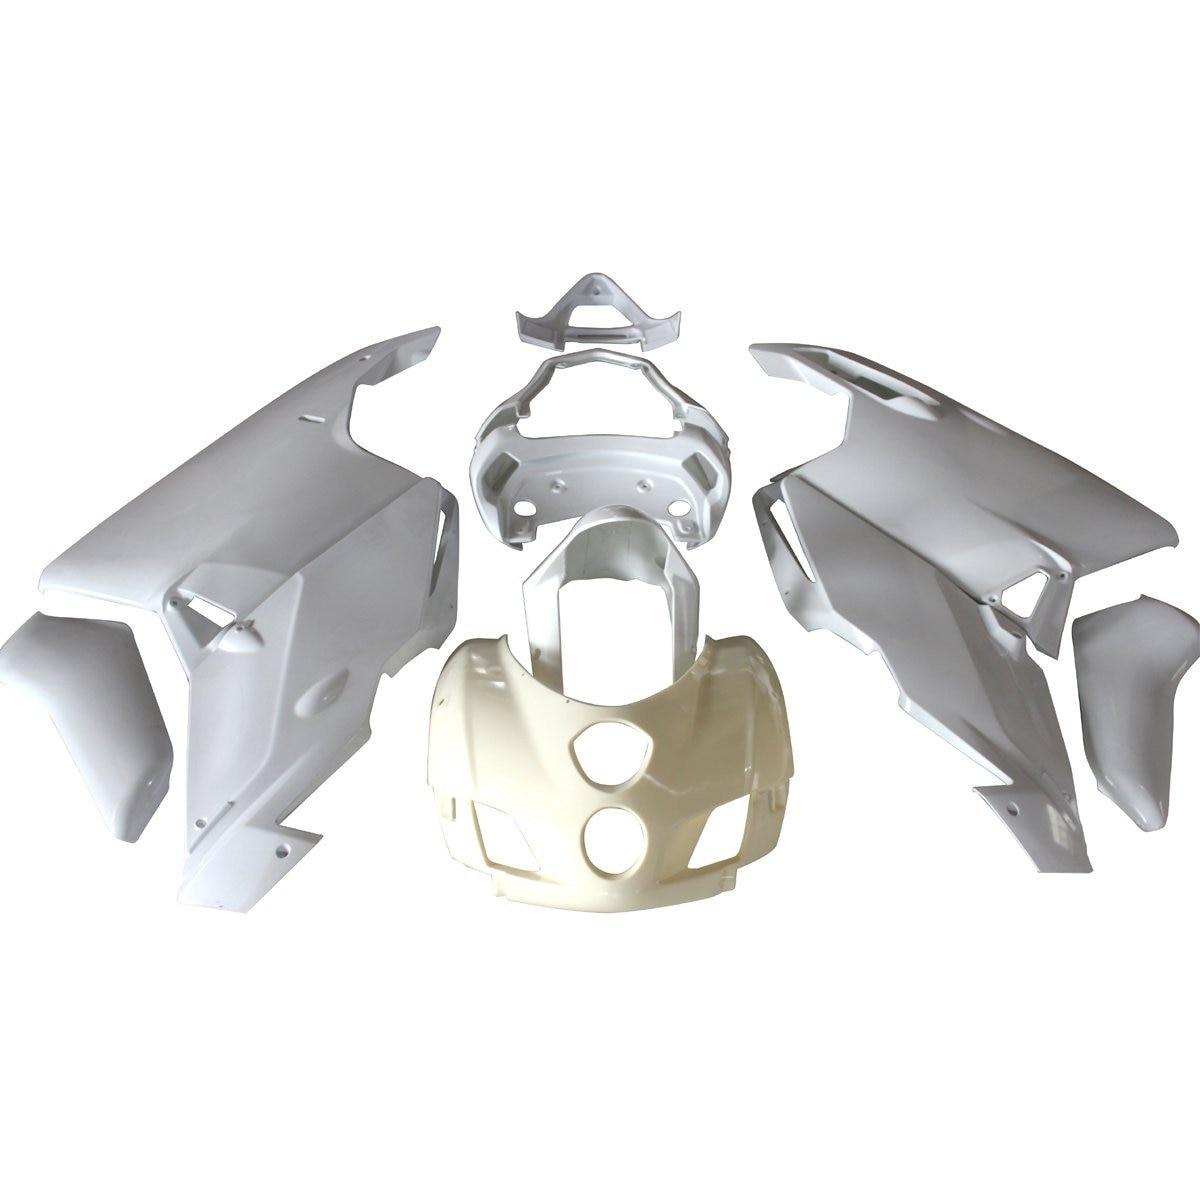 Motorcycle Unpainted Bodywork Fairing Kit For Ducati 999 / 749 2005 2006 05 06 Injection Molding Fairings Cowl Case ABS Plastic custom design monster color top grade quality injection mold fairings bodywork for ducati 999 749 03 04 kits